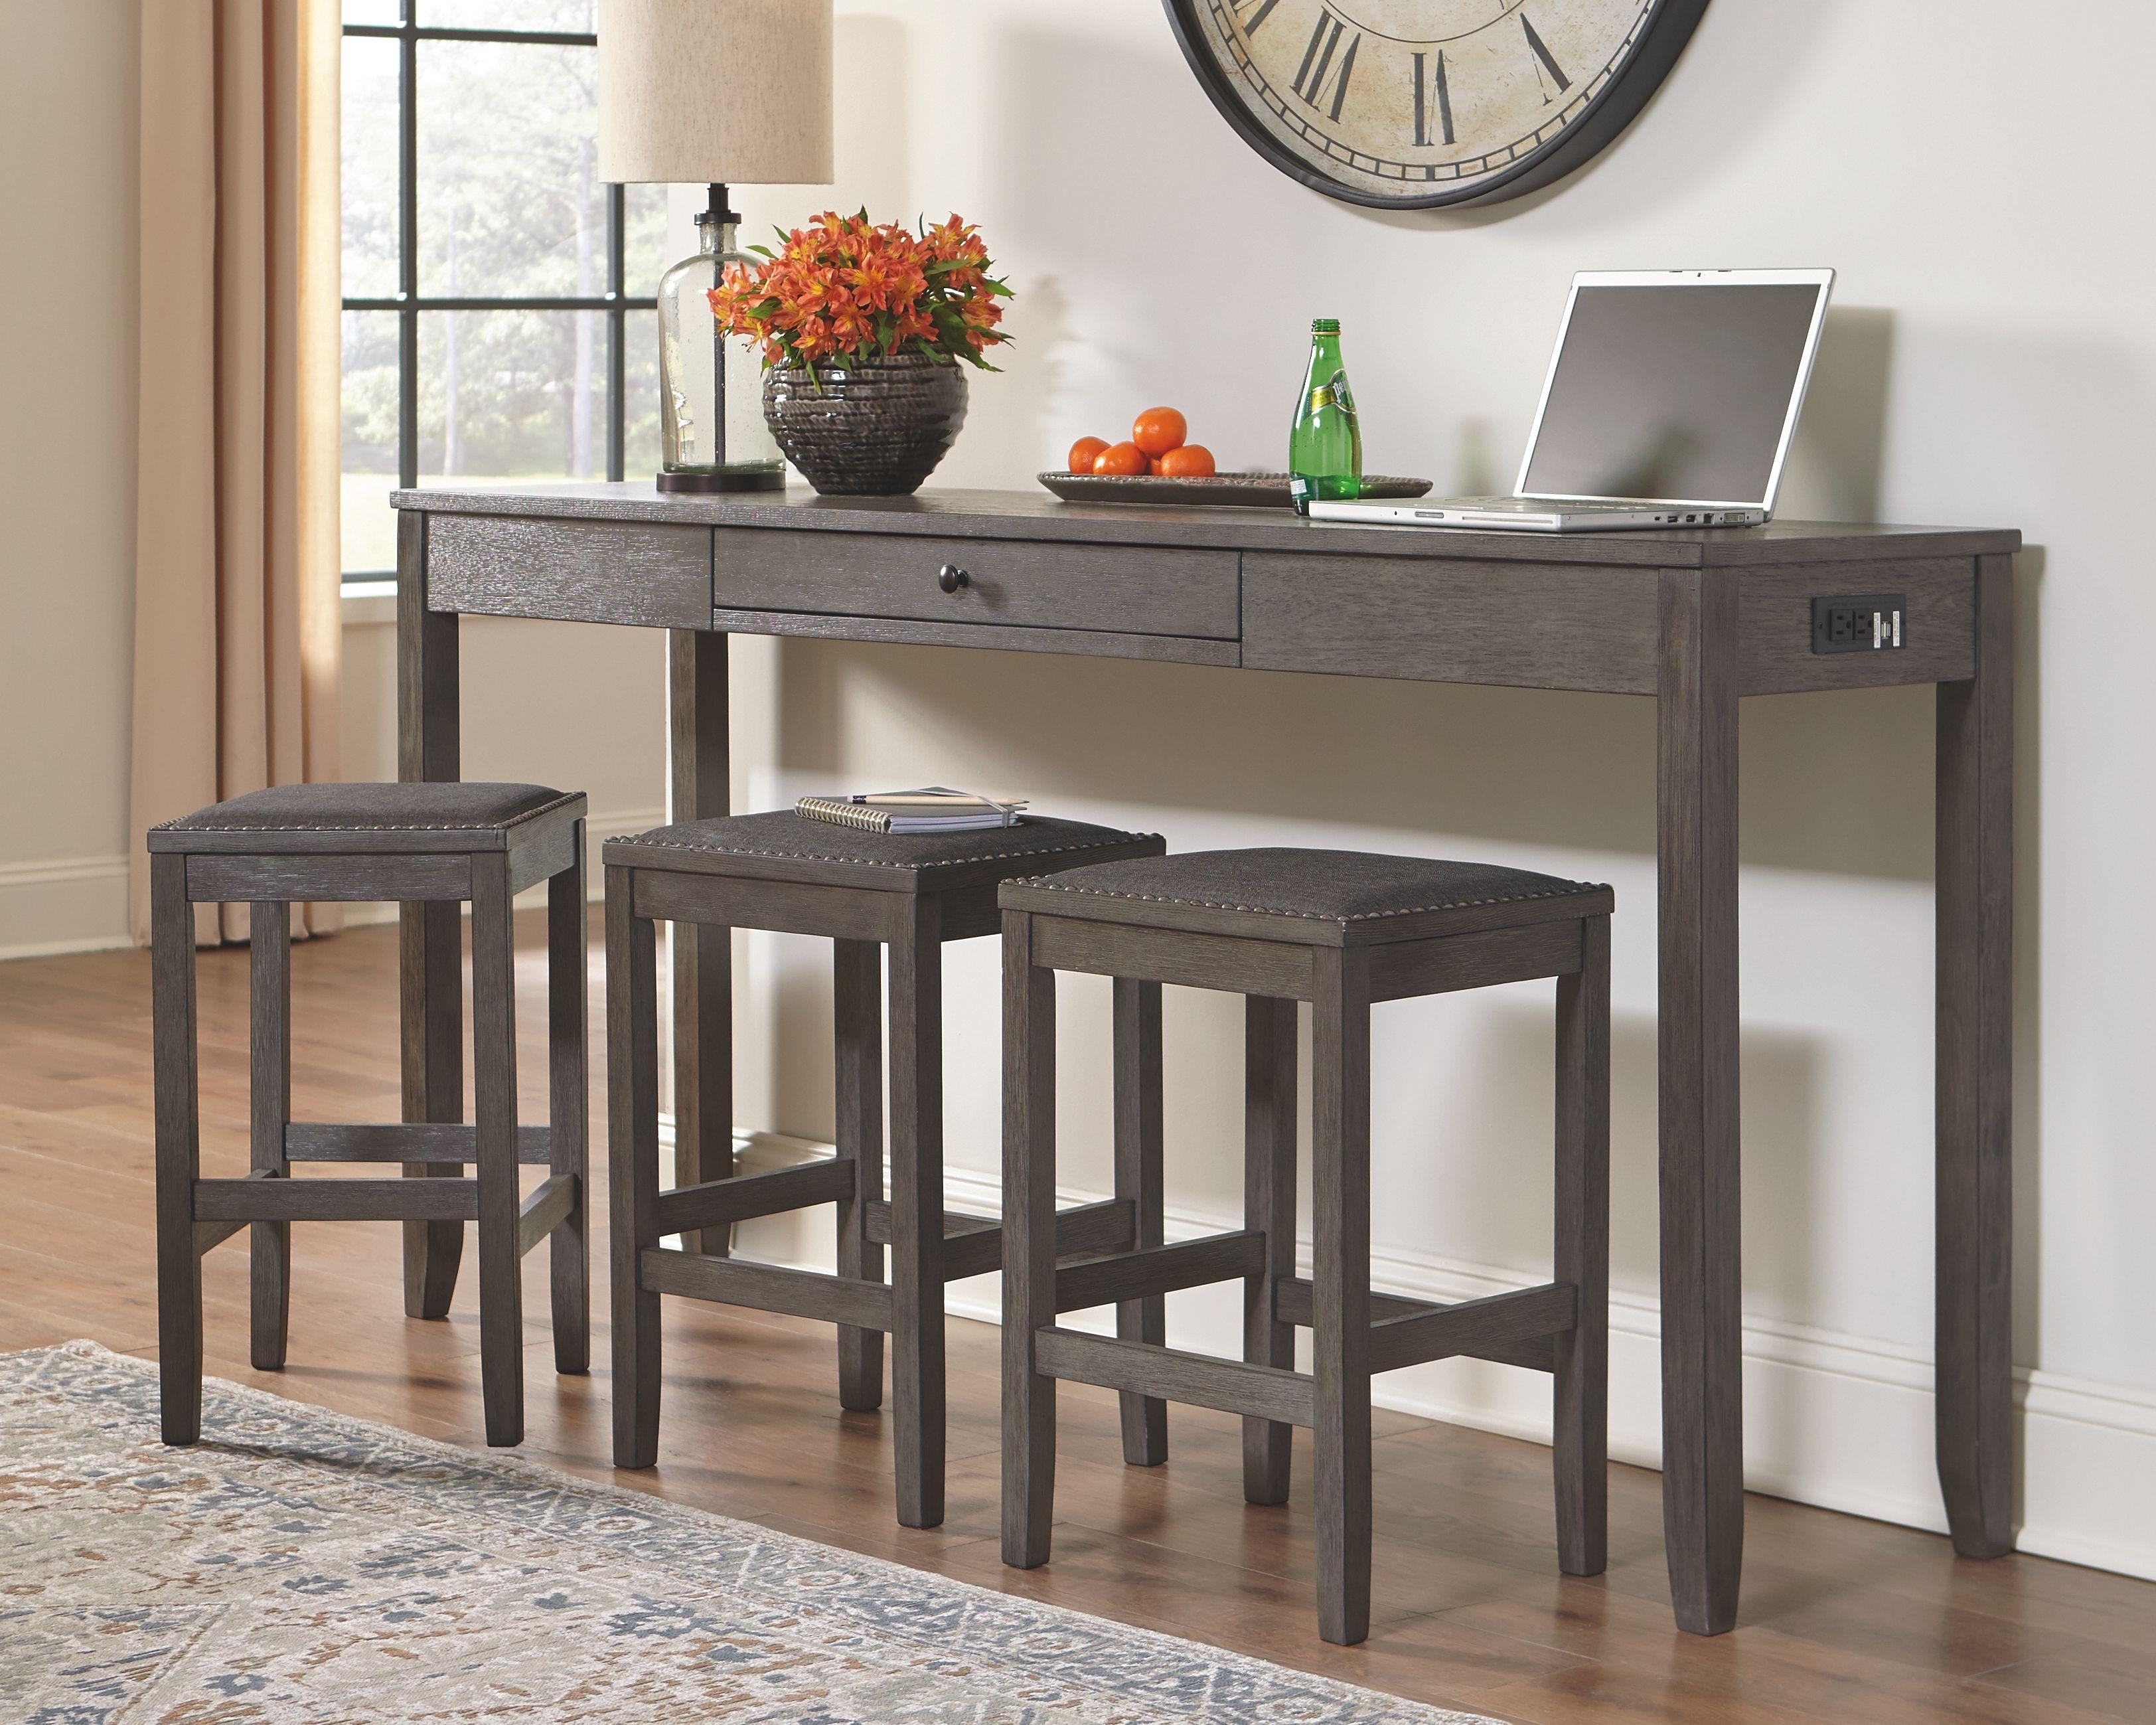 34+ Caitbrook gray rectangular counter height dining table Trending